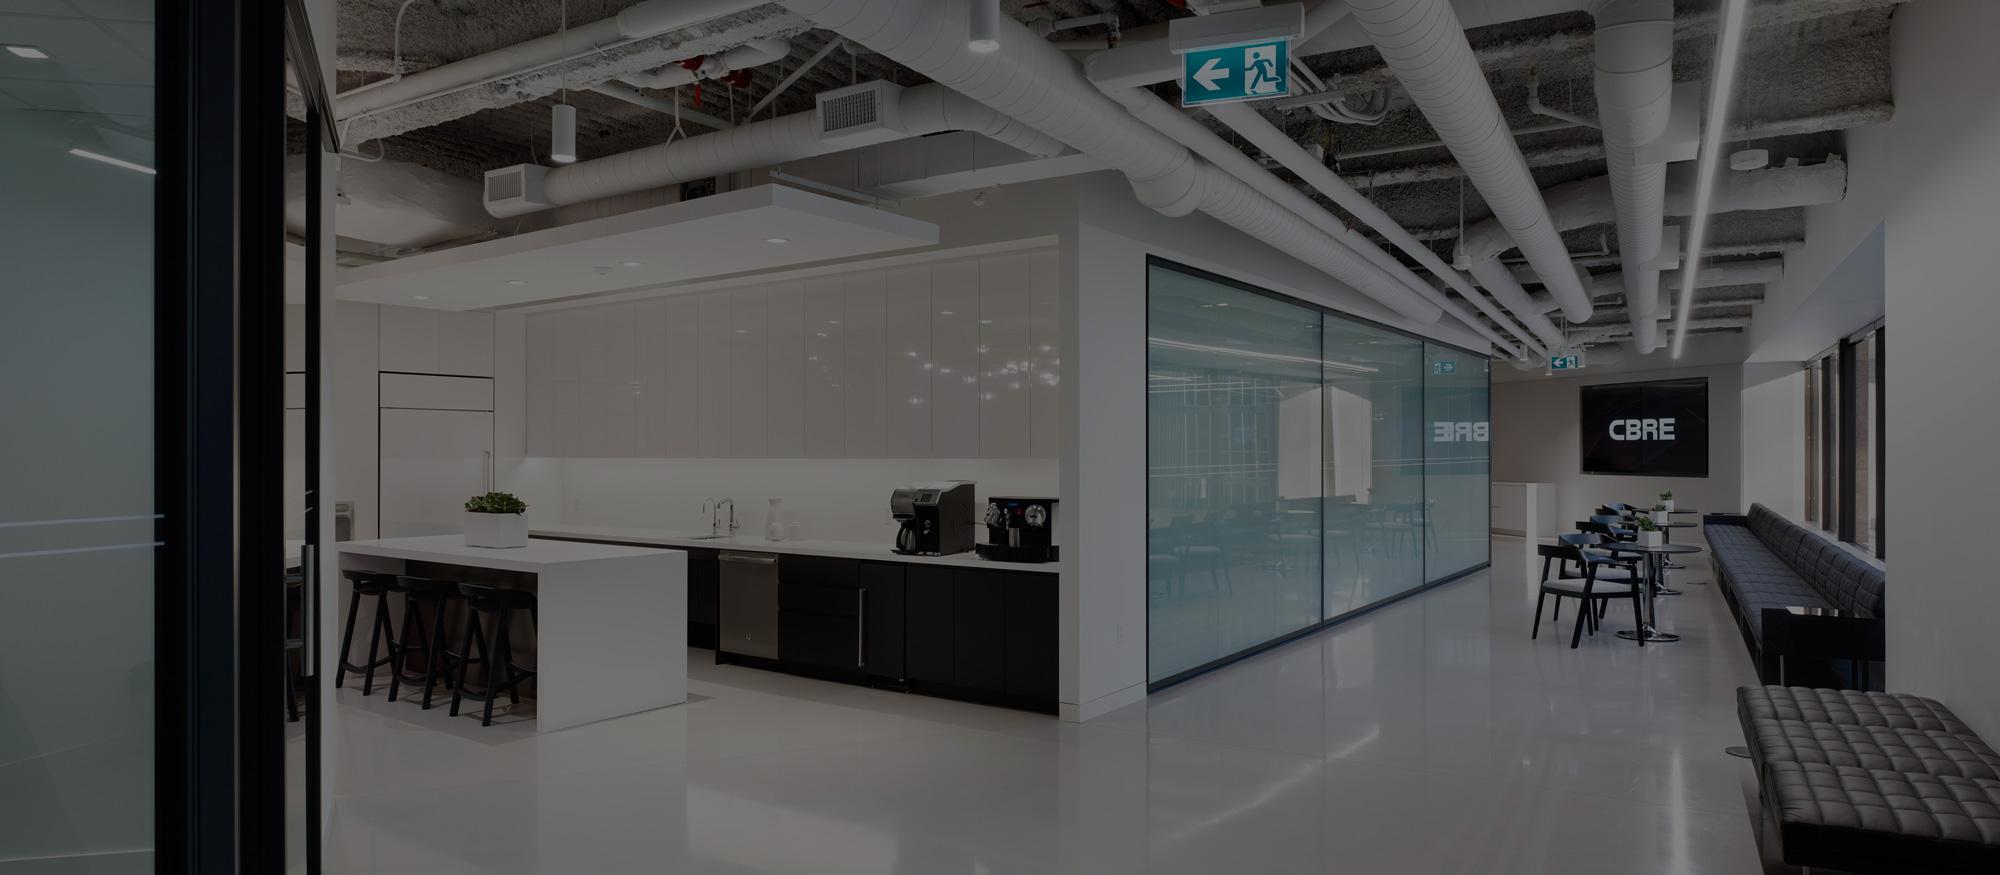 Commercial Lighting Agency With Designer Fixtures